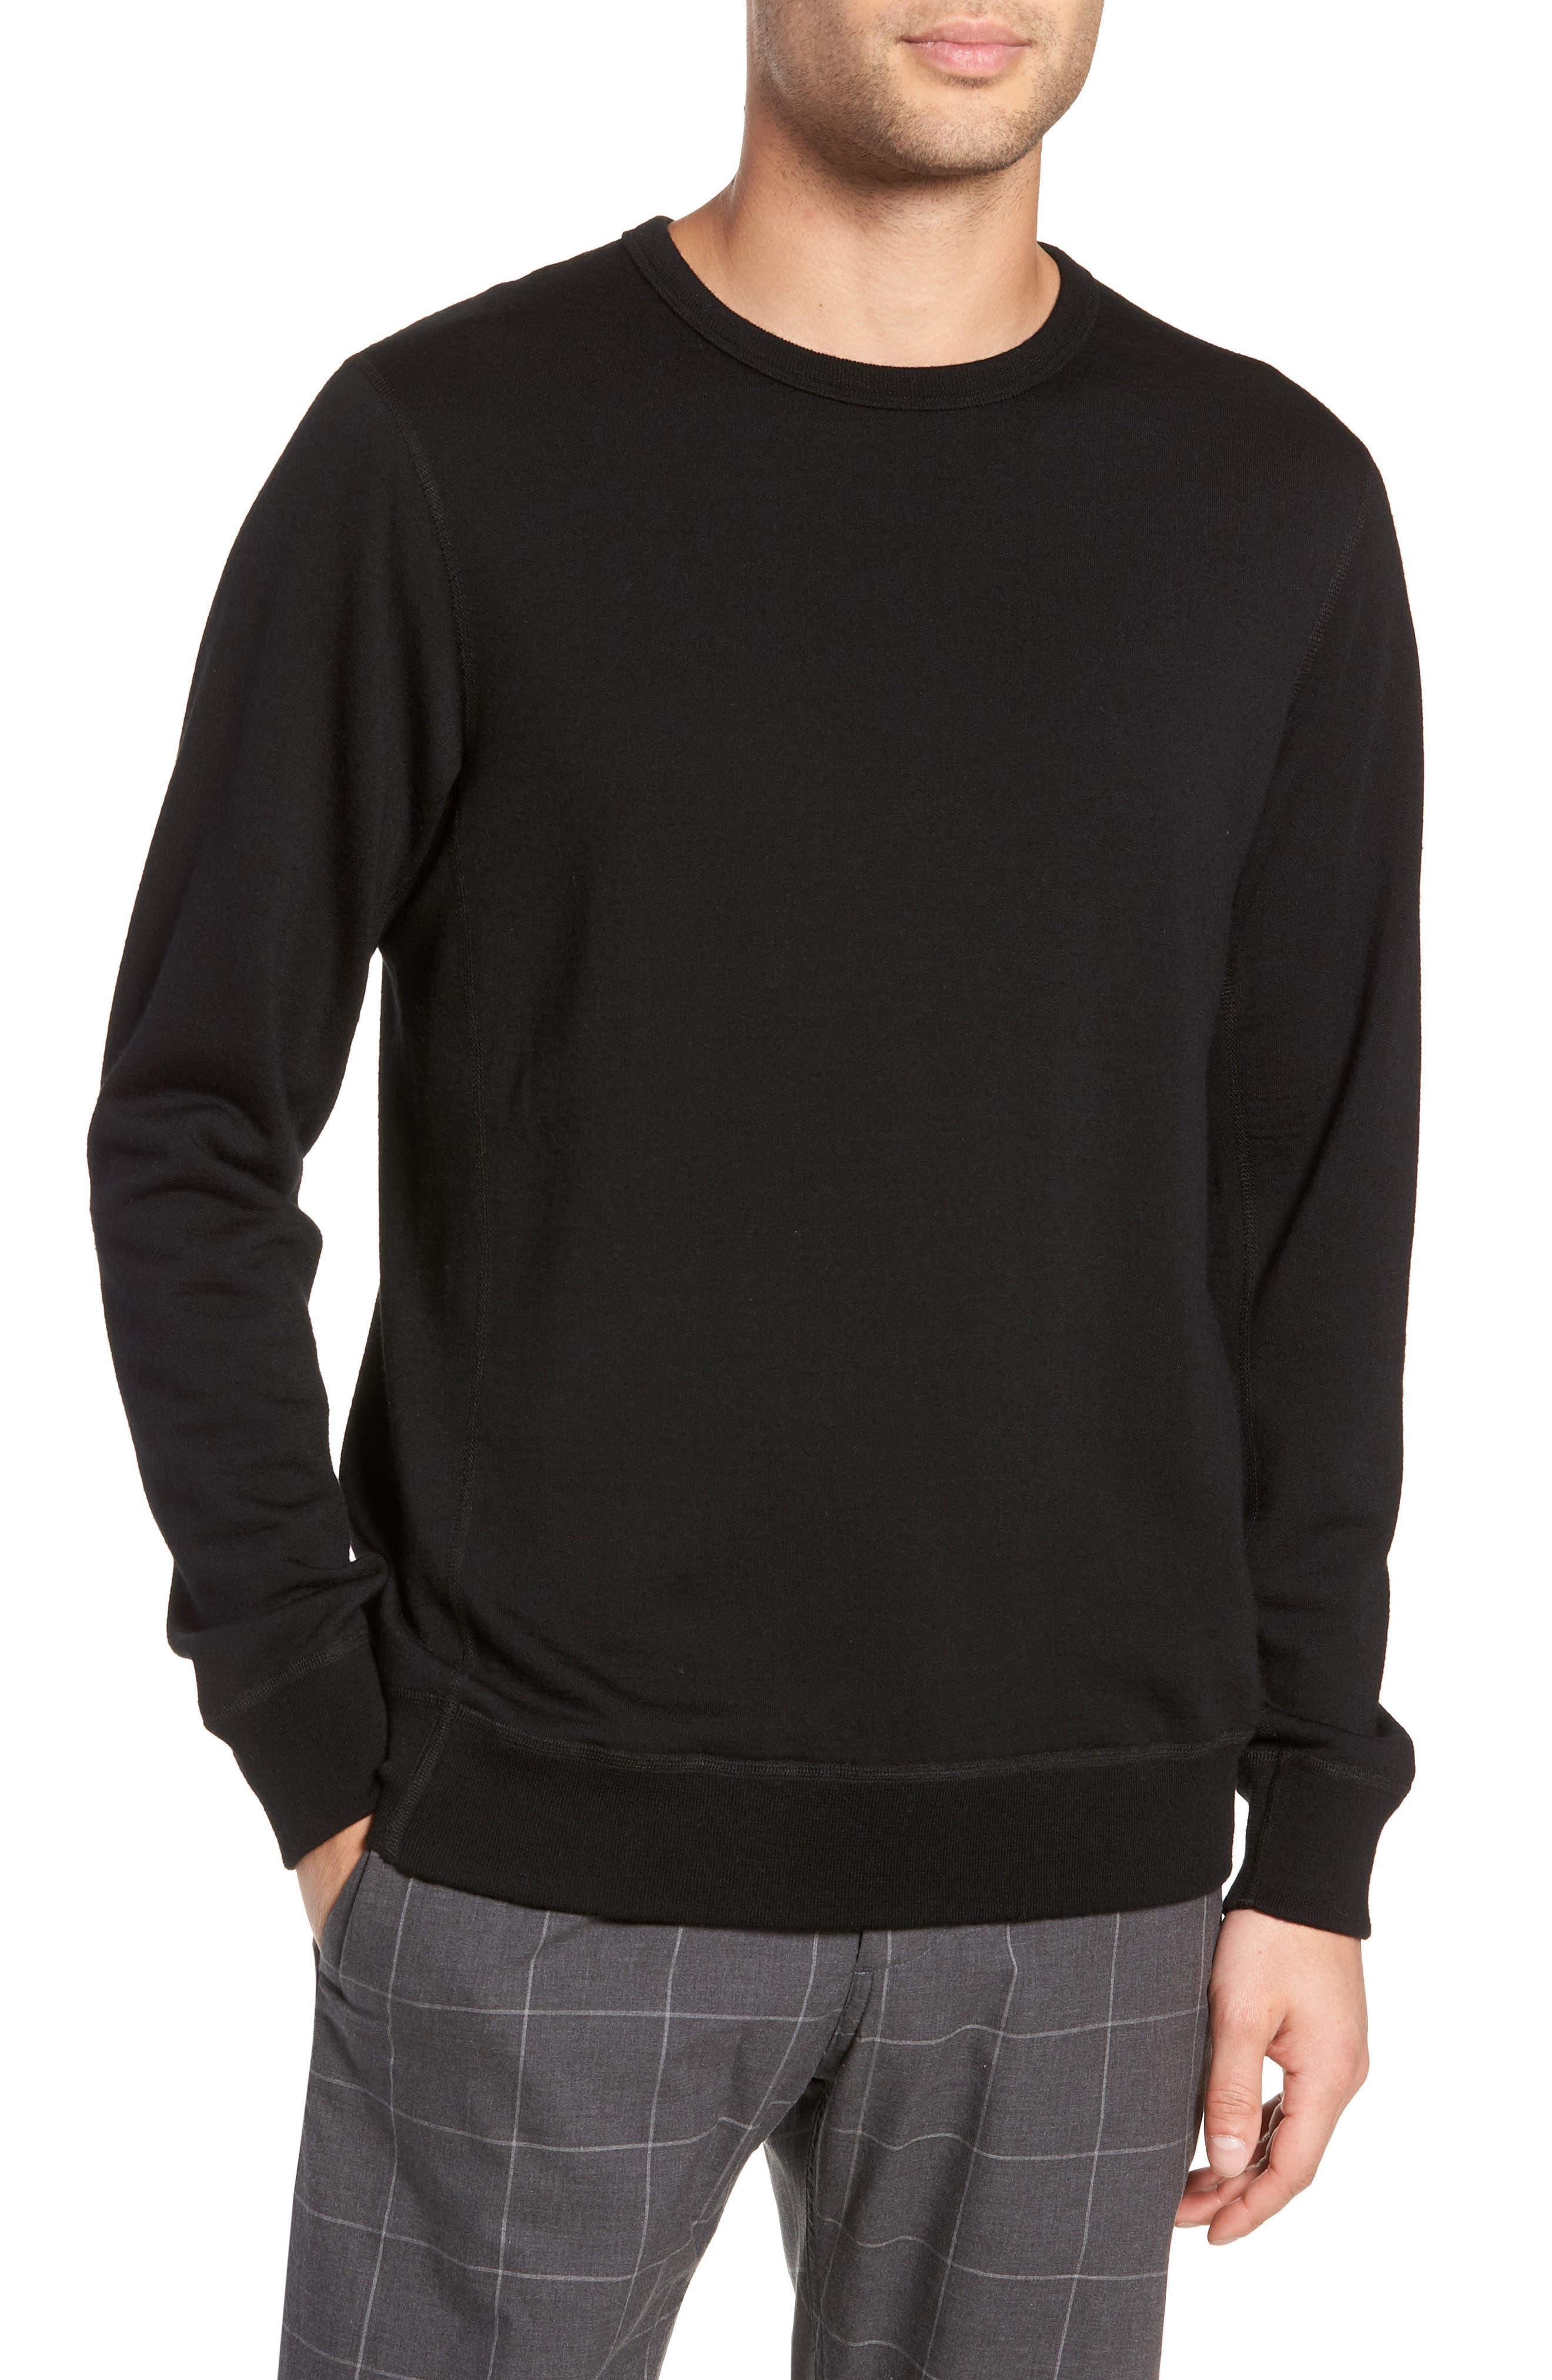 Swedish Merino Wool T-Shirt,                         Main,                         color, BLACK